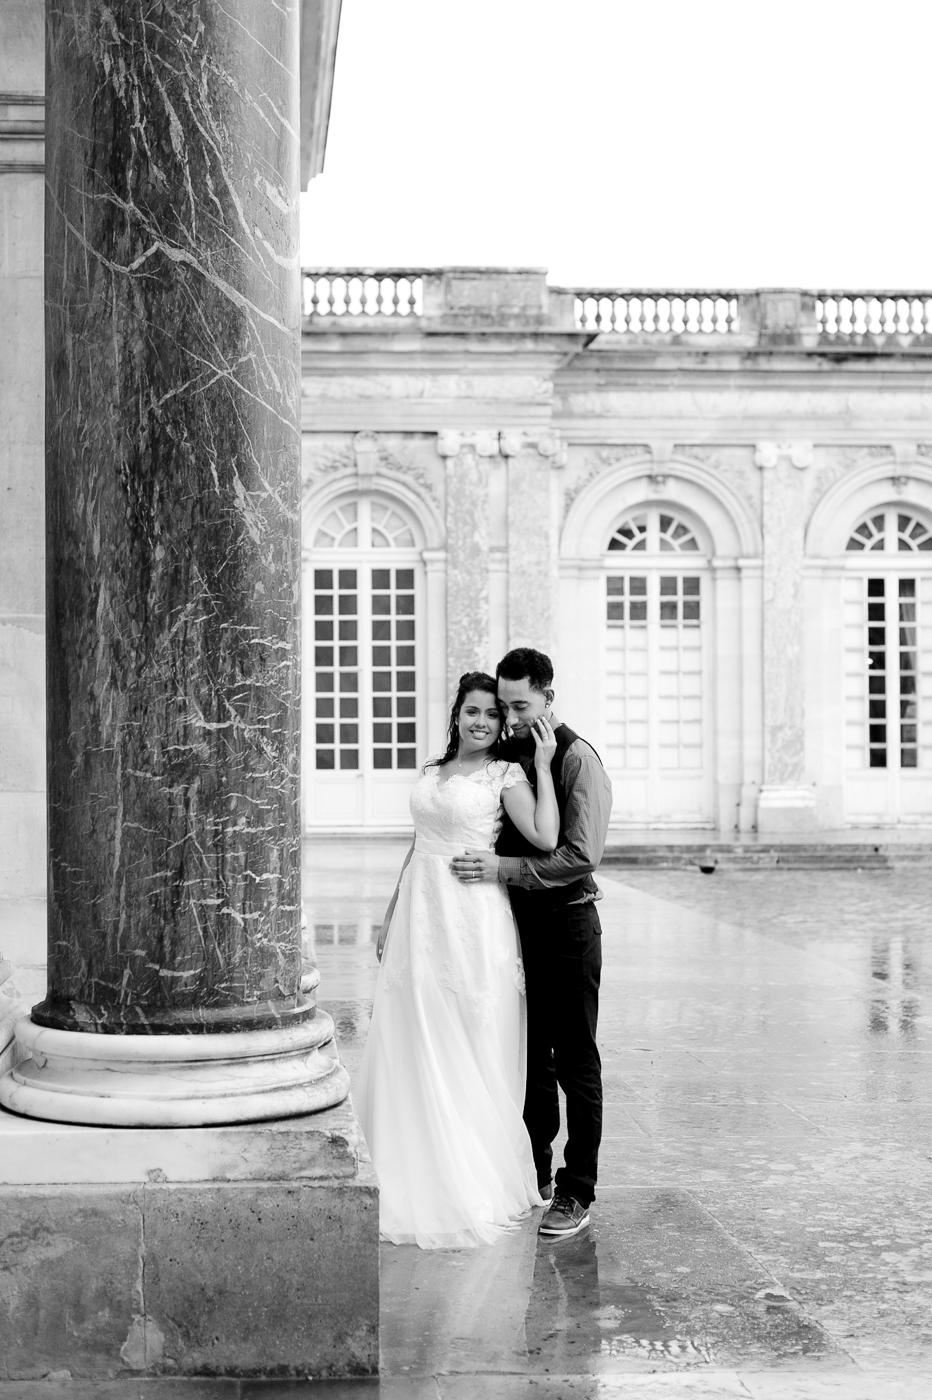 fotos de casamento versailles